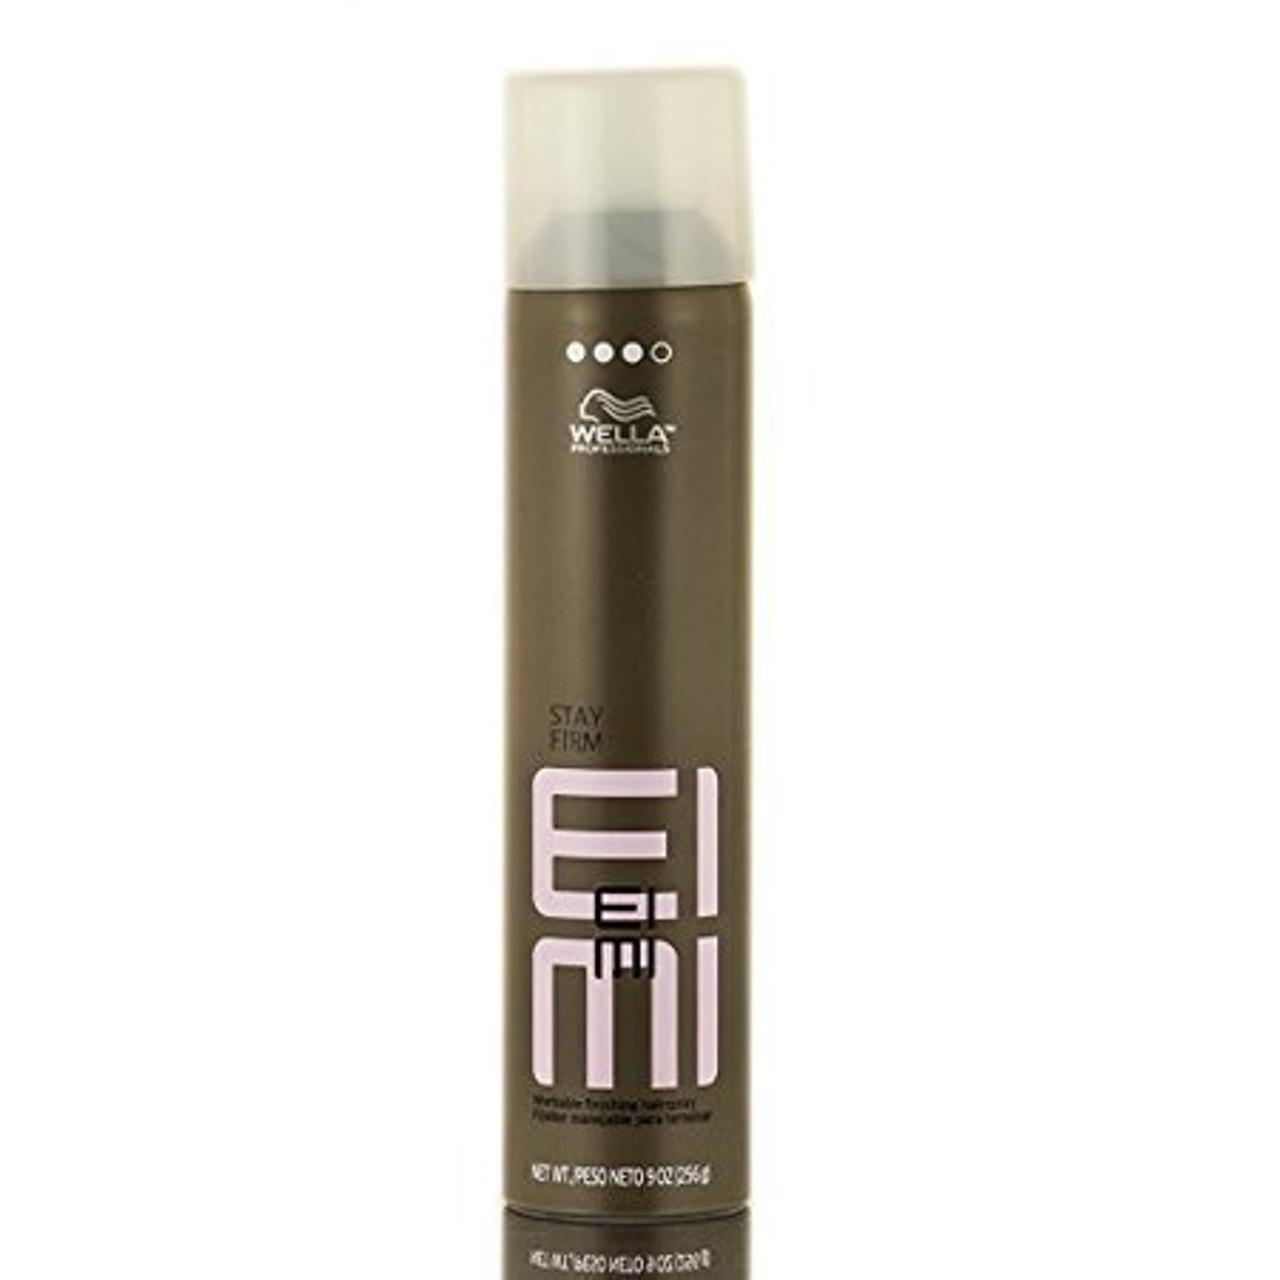 EIMI Stay Firm Workable Finishing Hair Spray 9 Oz Women